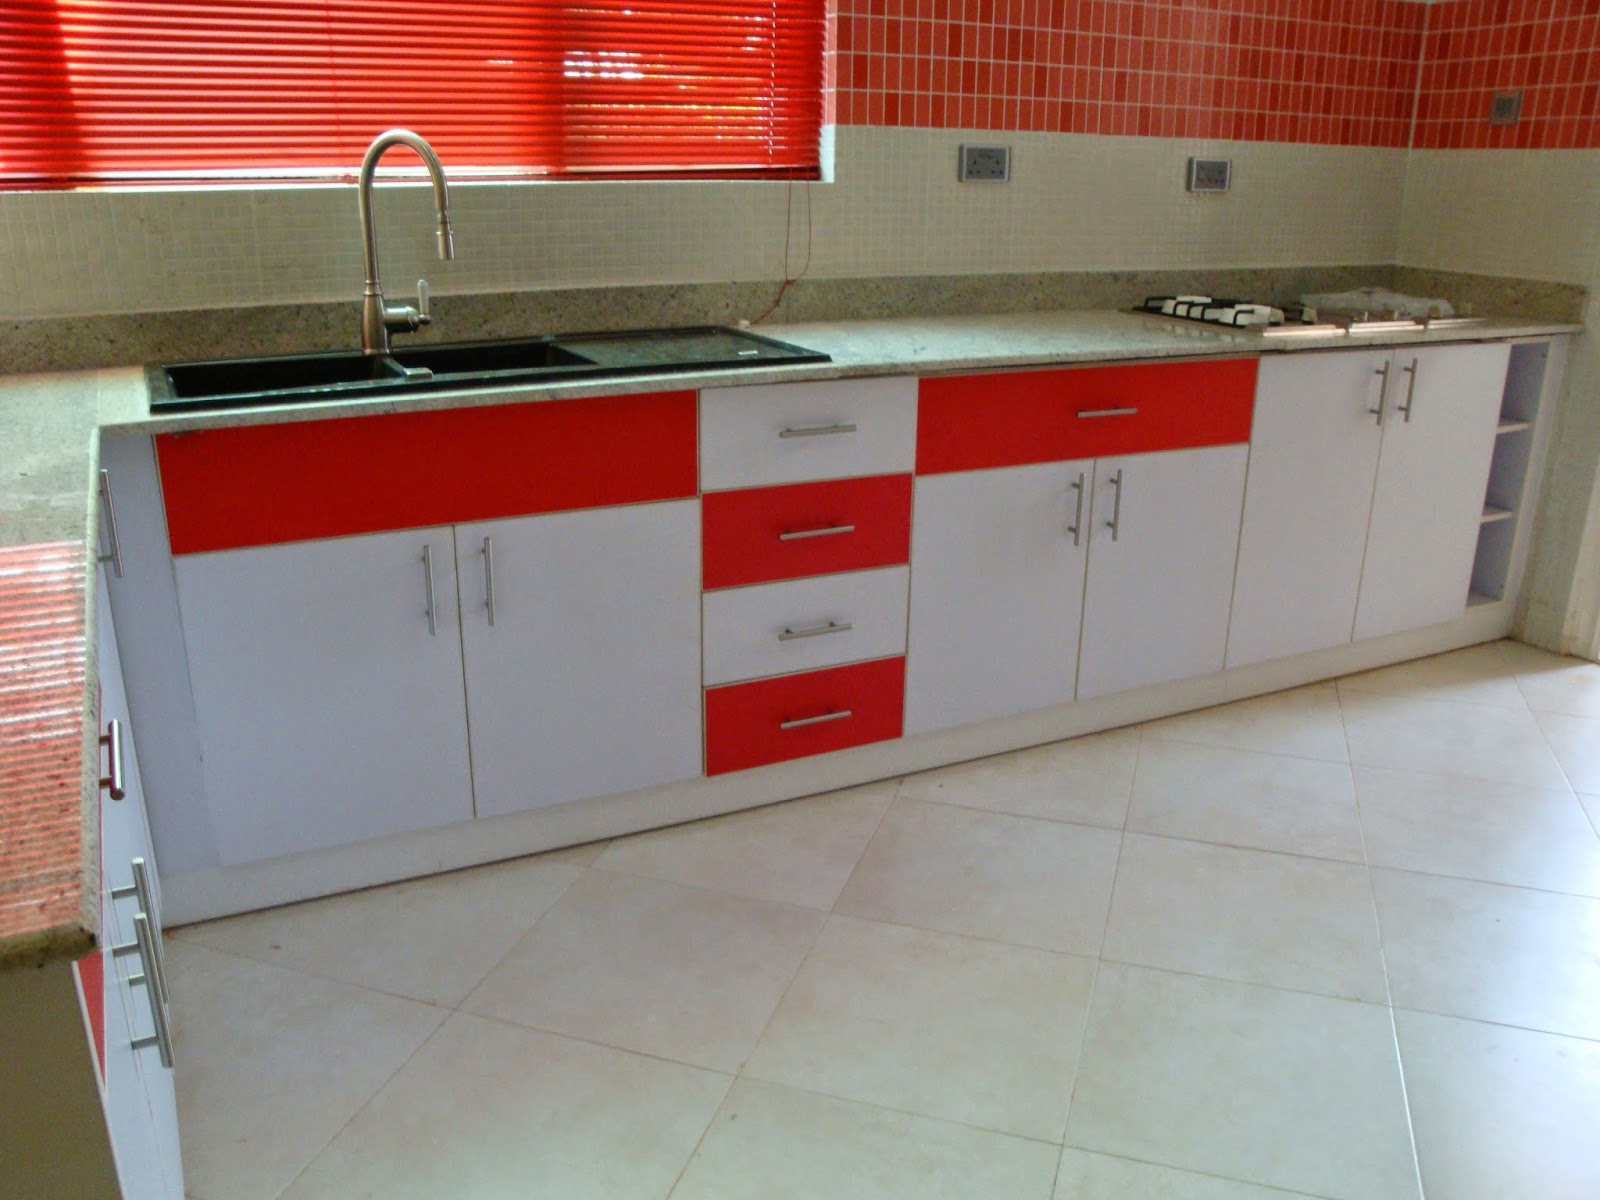 Kitchen Cabinets In White U0026 Red Laminate